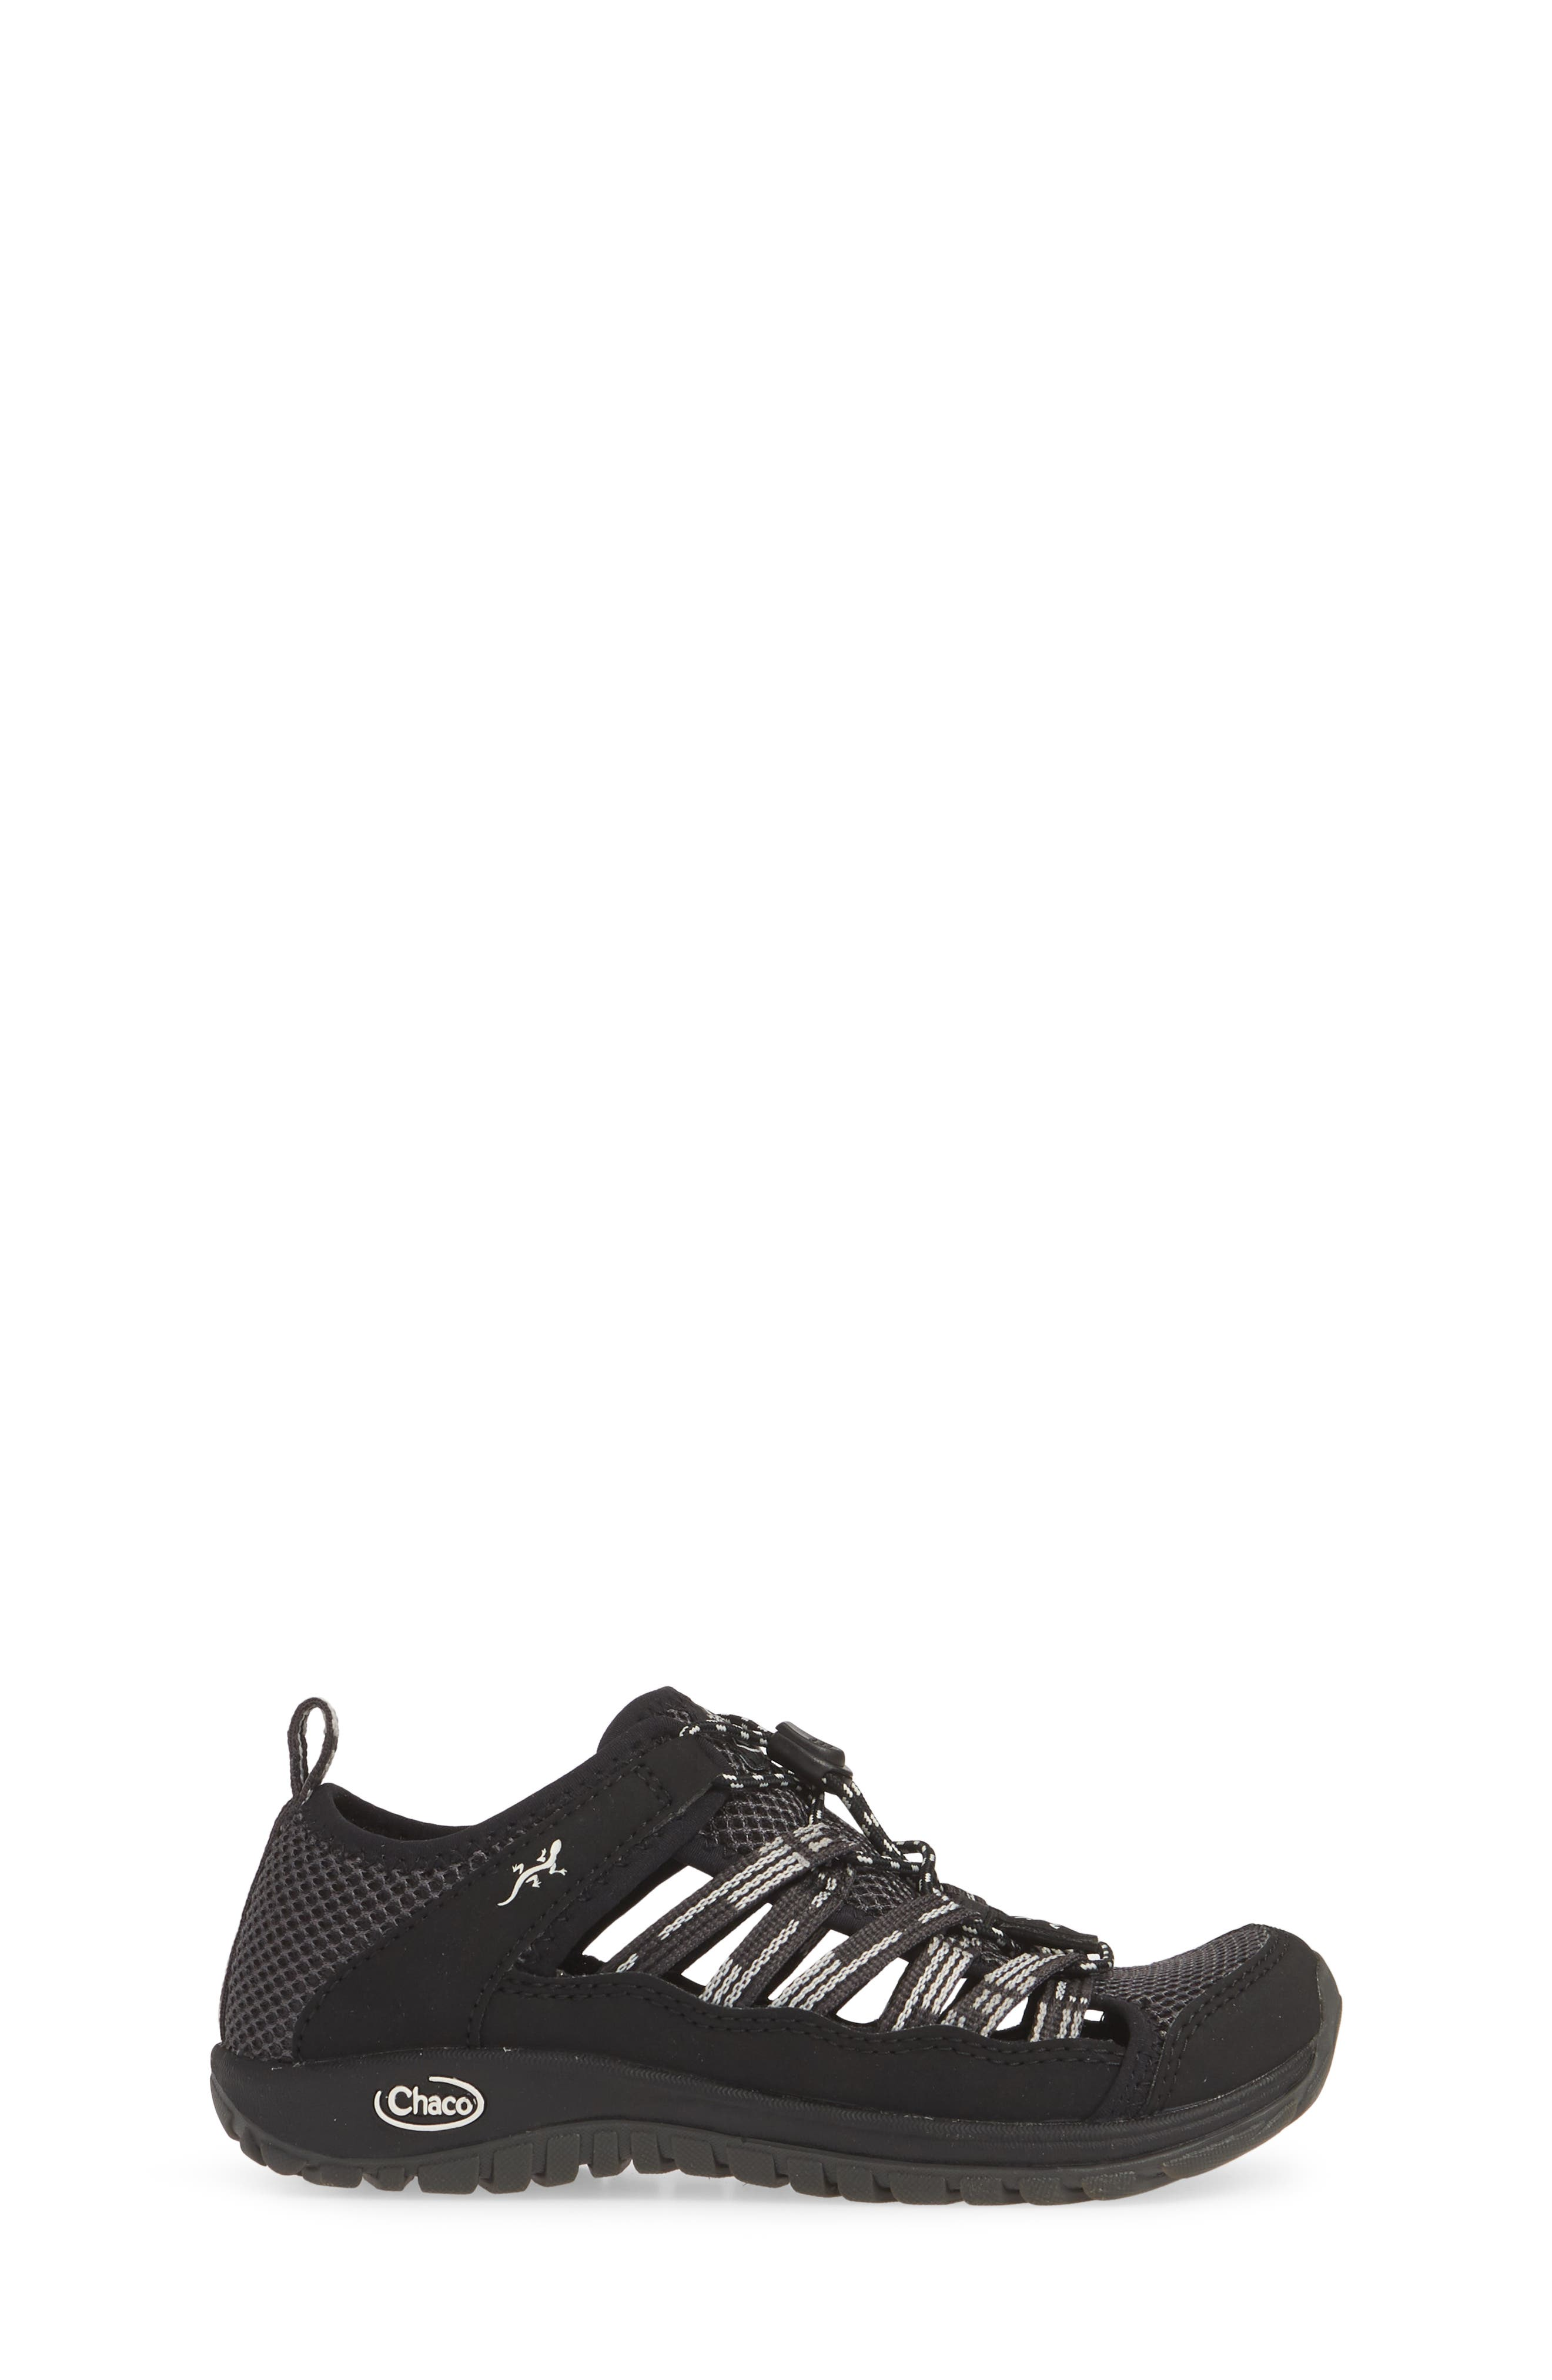 CHACO, Outcross 2 Water Sneaker, Alternate thumbnail 3, color, PAVEMENT BLACK